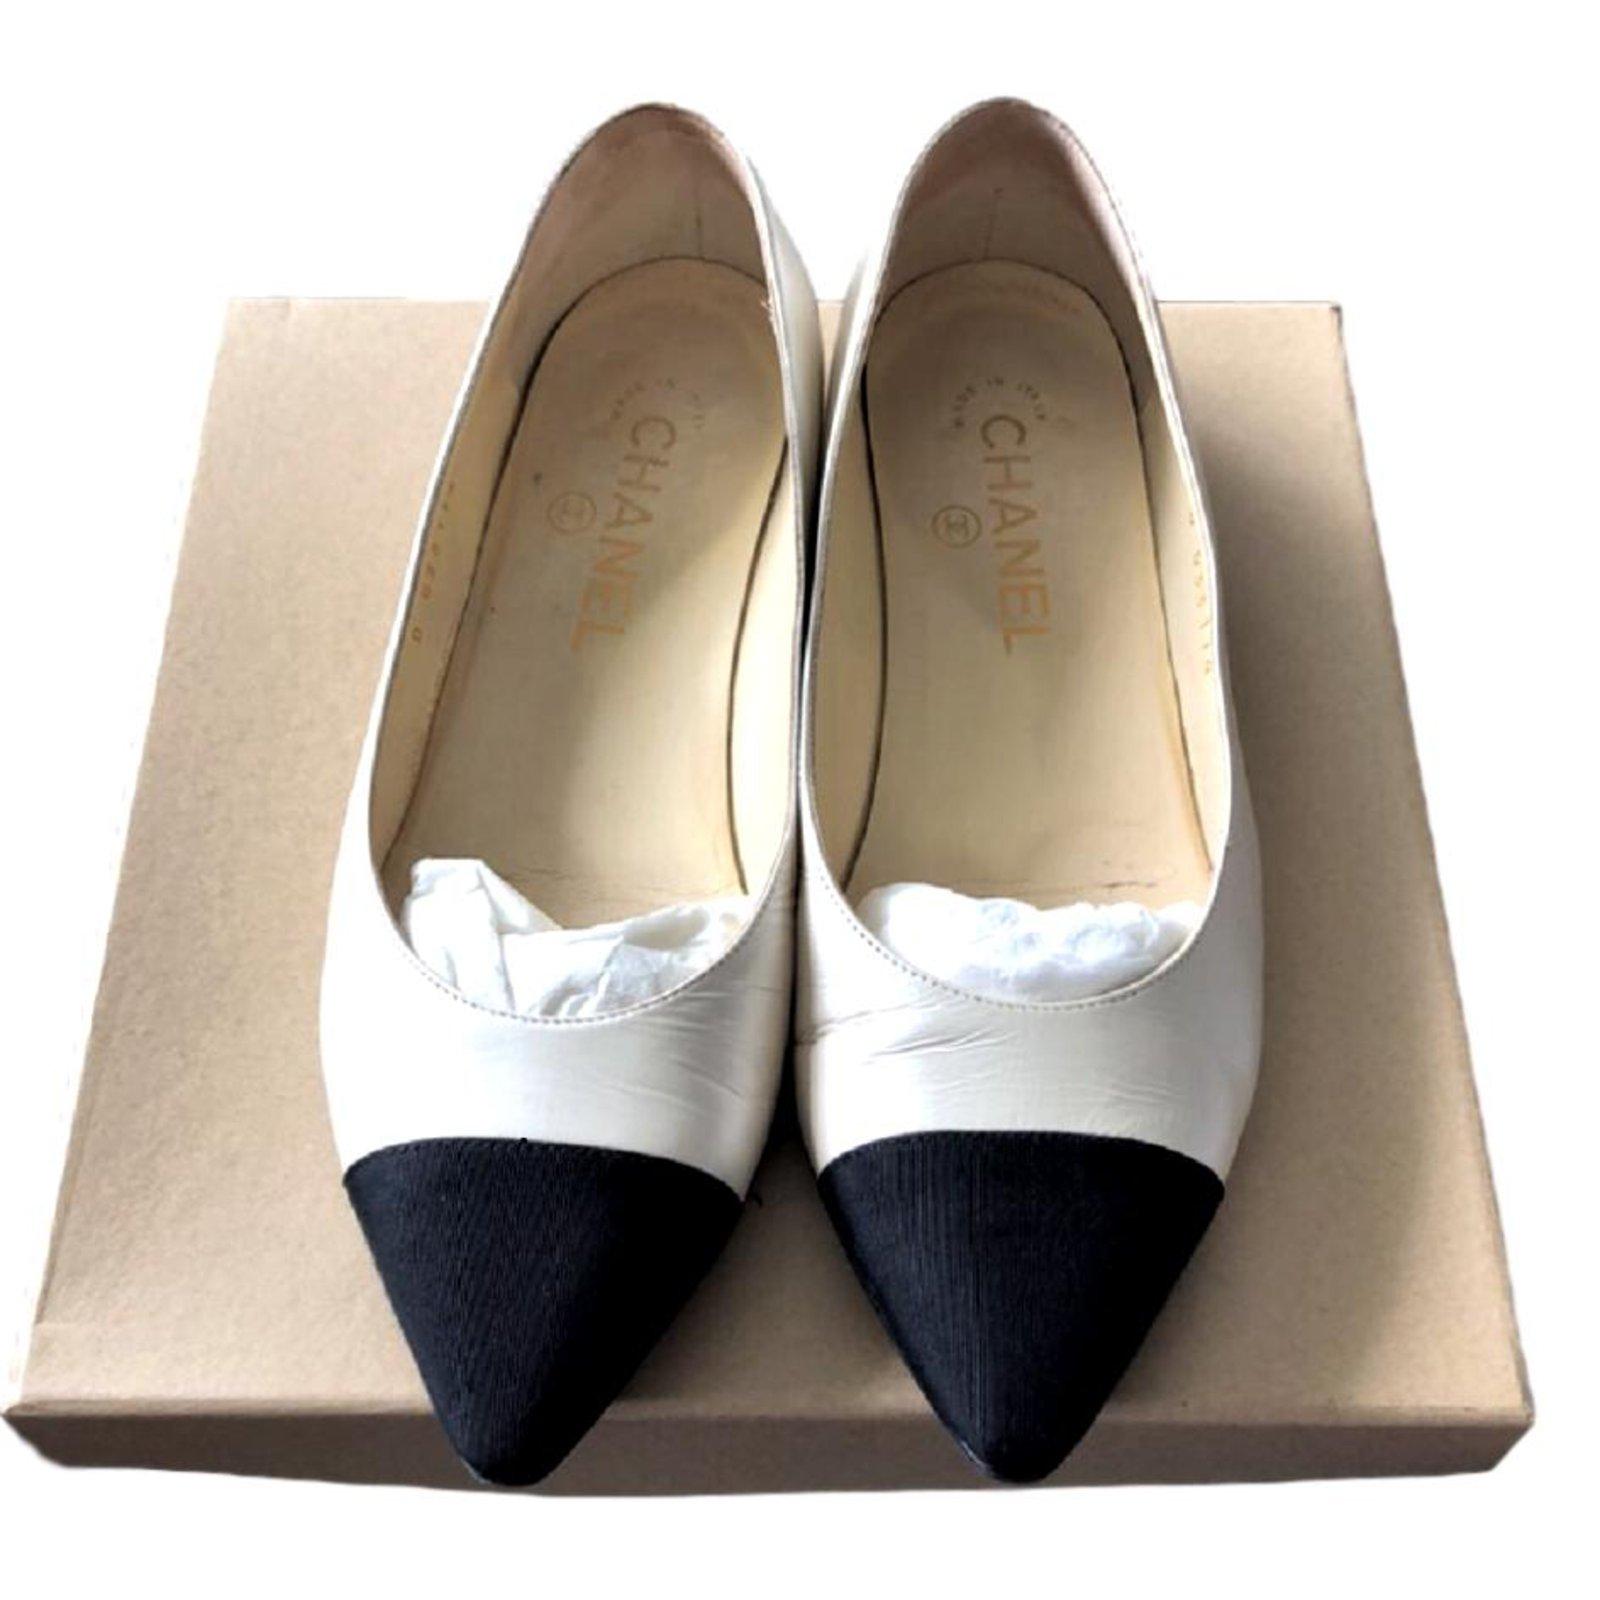 White flats EU 36.5 Flats Leather,Cloth